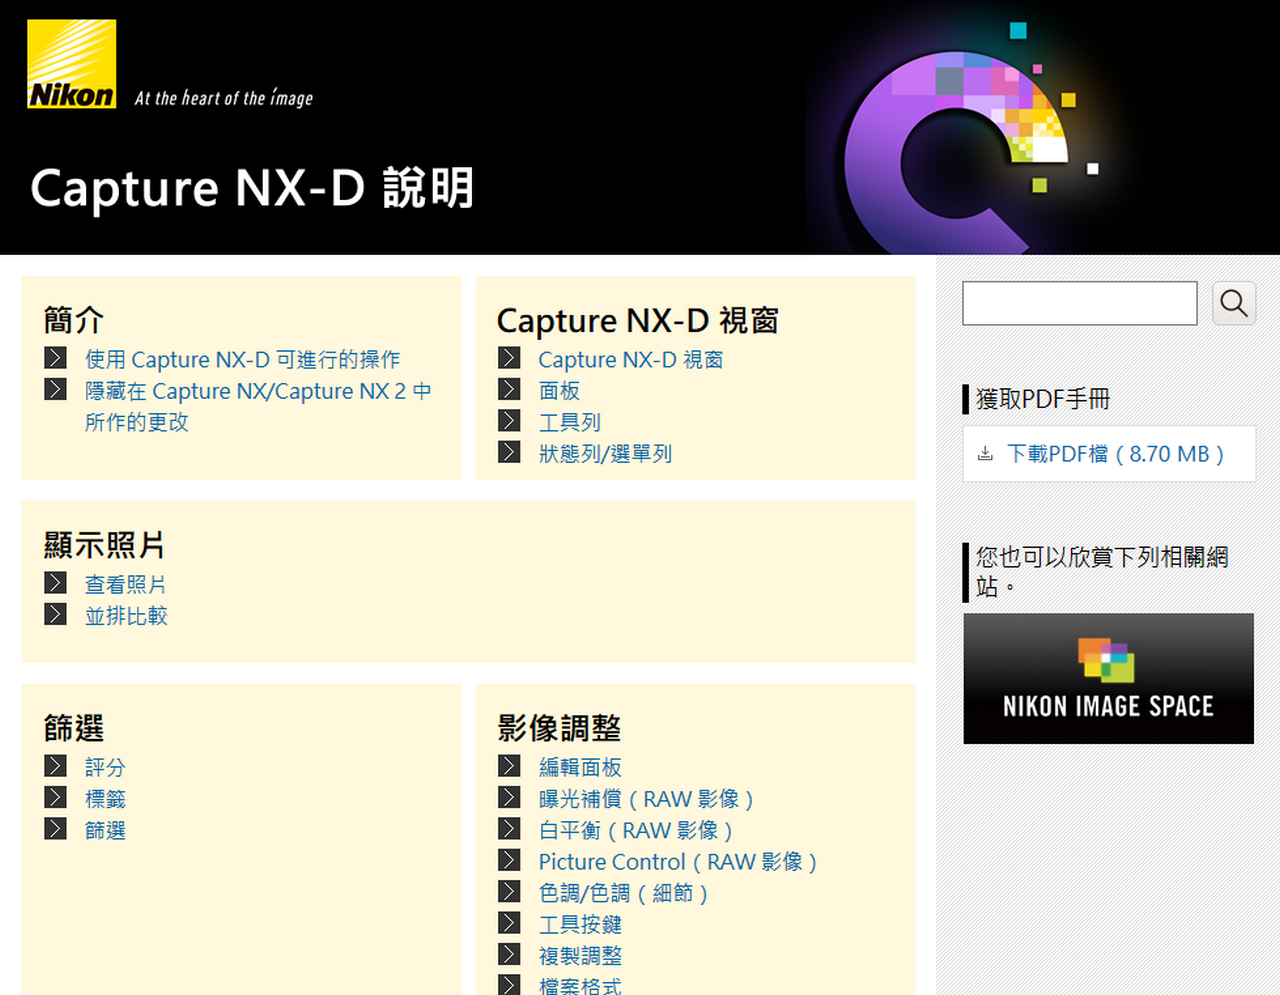 Nikon NEF (RAW檔) 官方修圖 Capture NX-D03